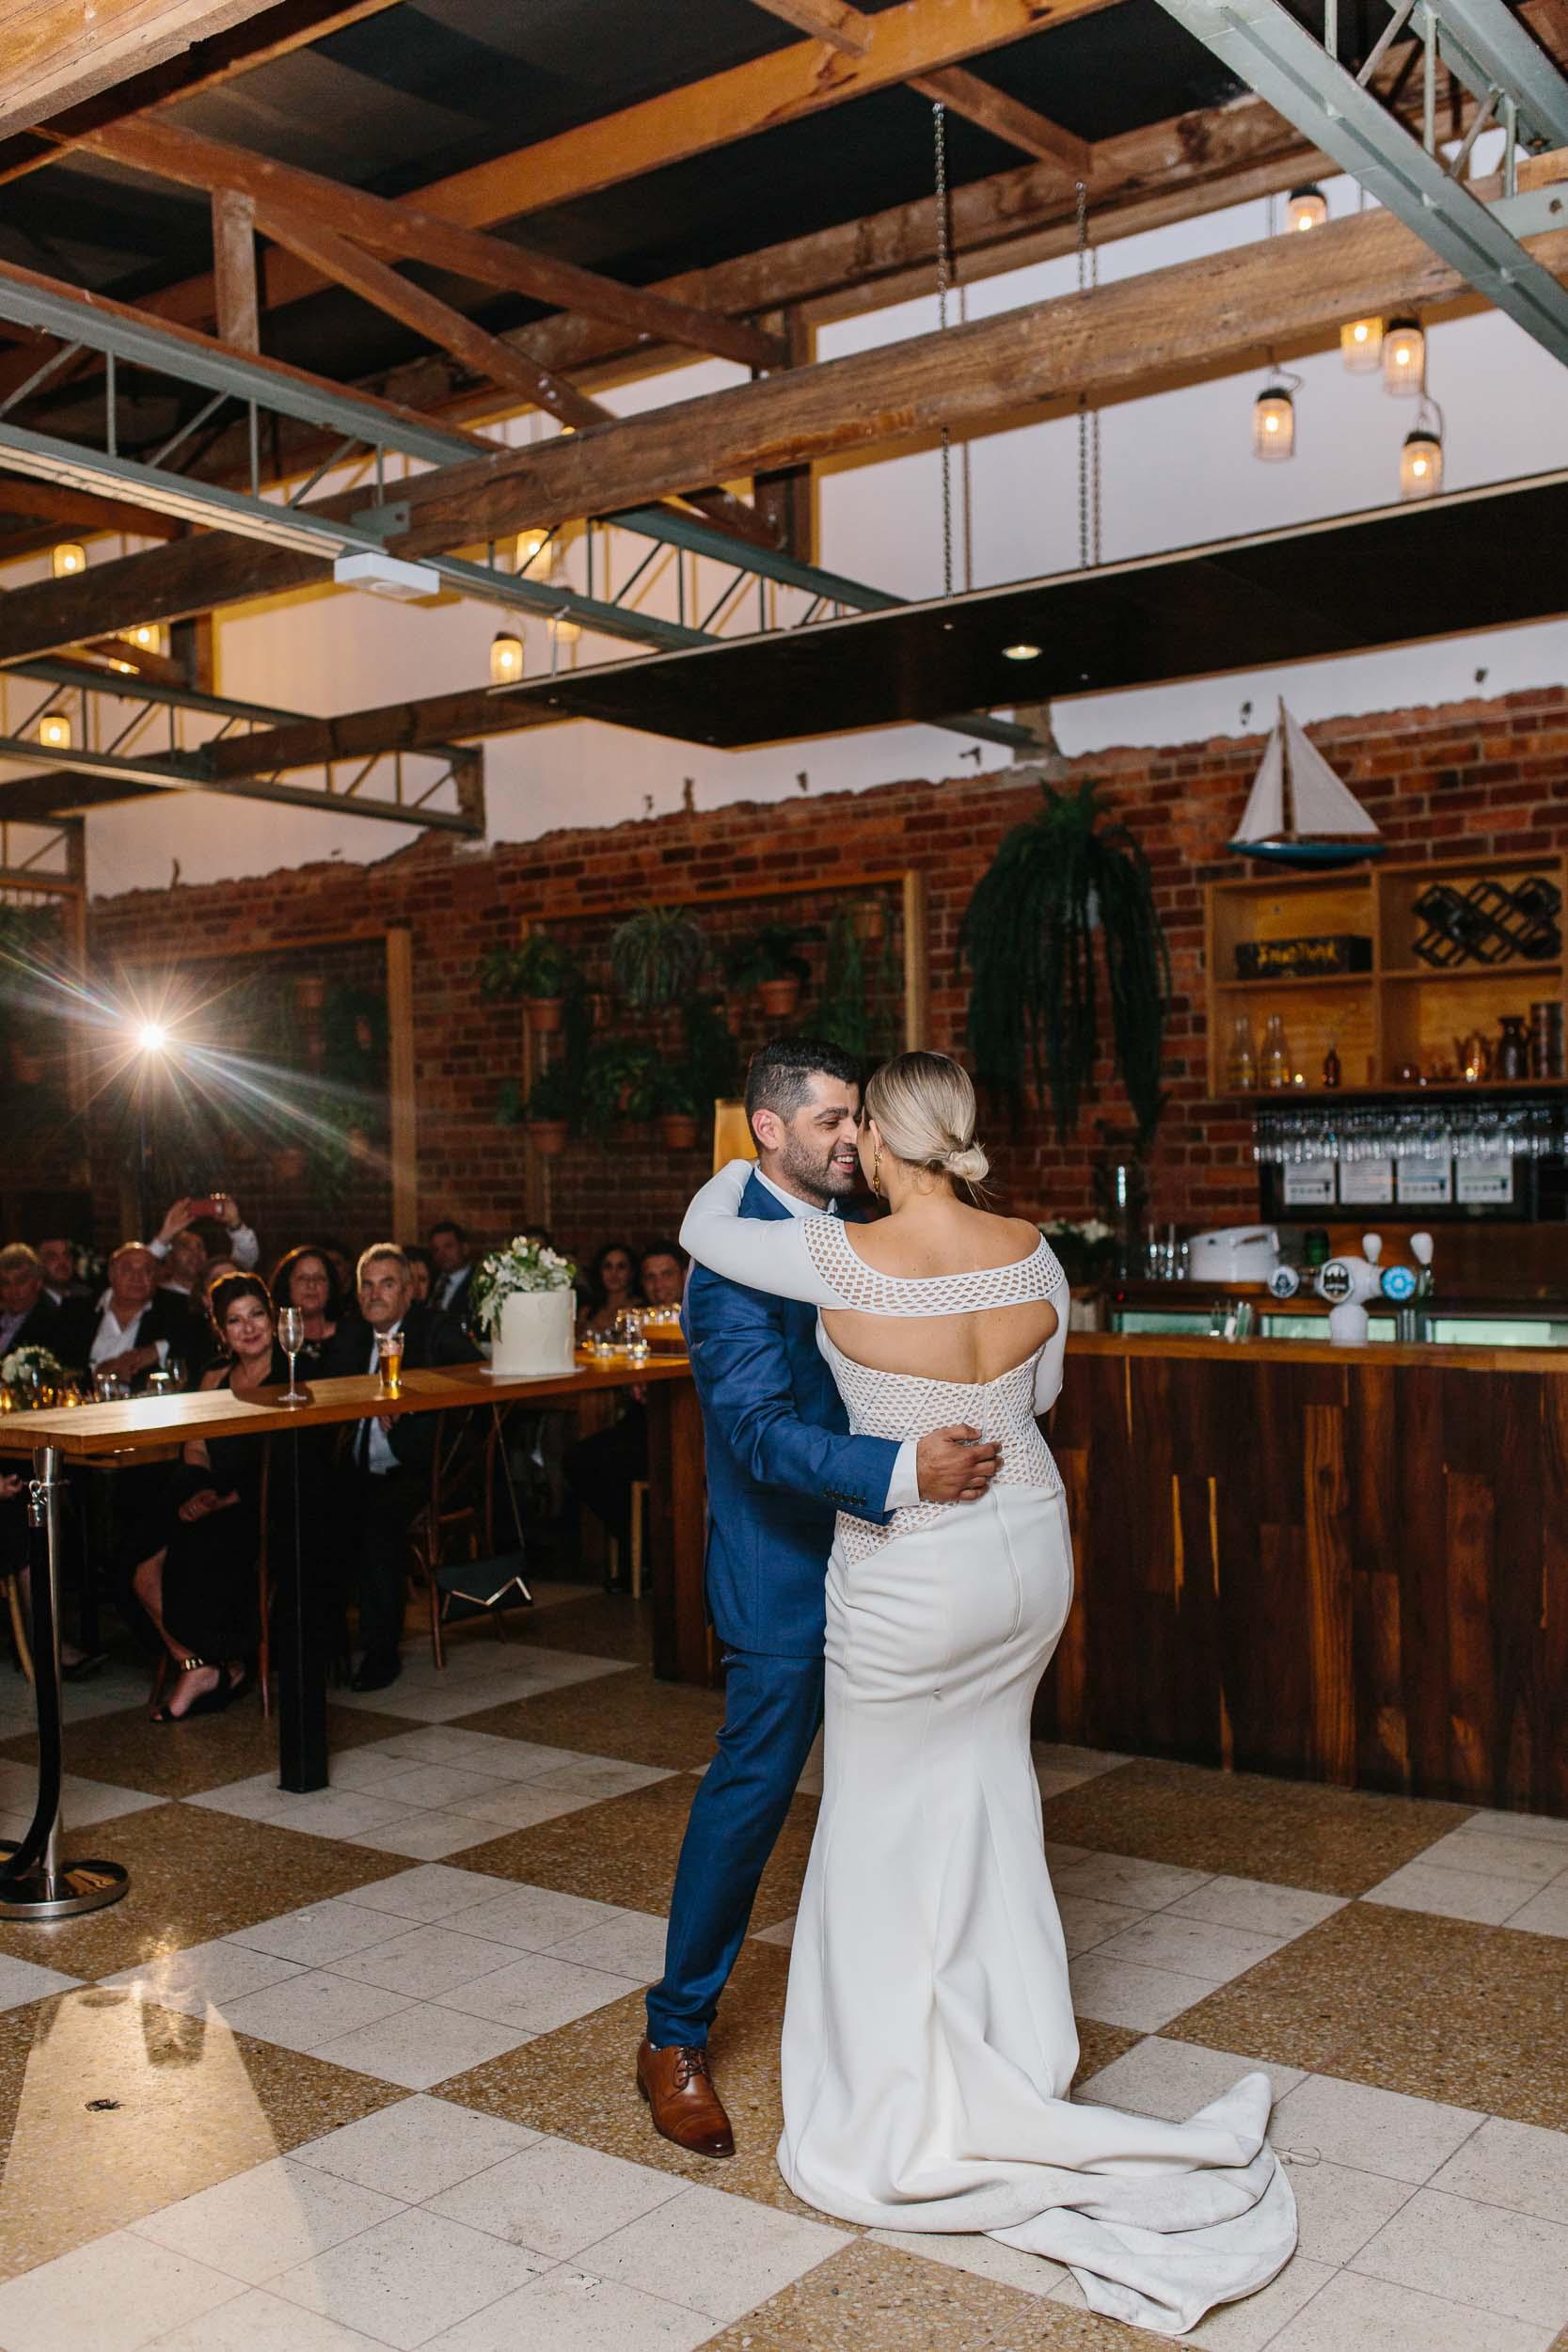 Kas-Richards-Urban-Melbourne-Wedding-Jason-Grech-776.jpg